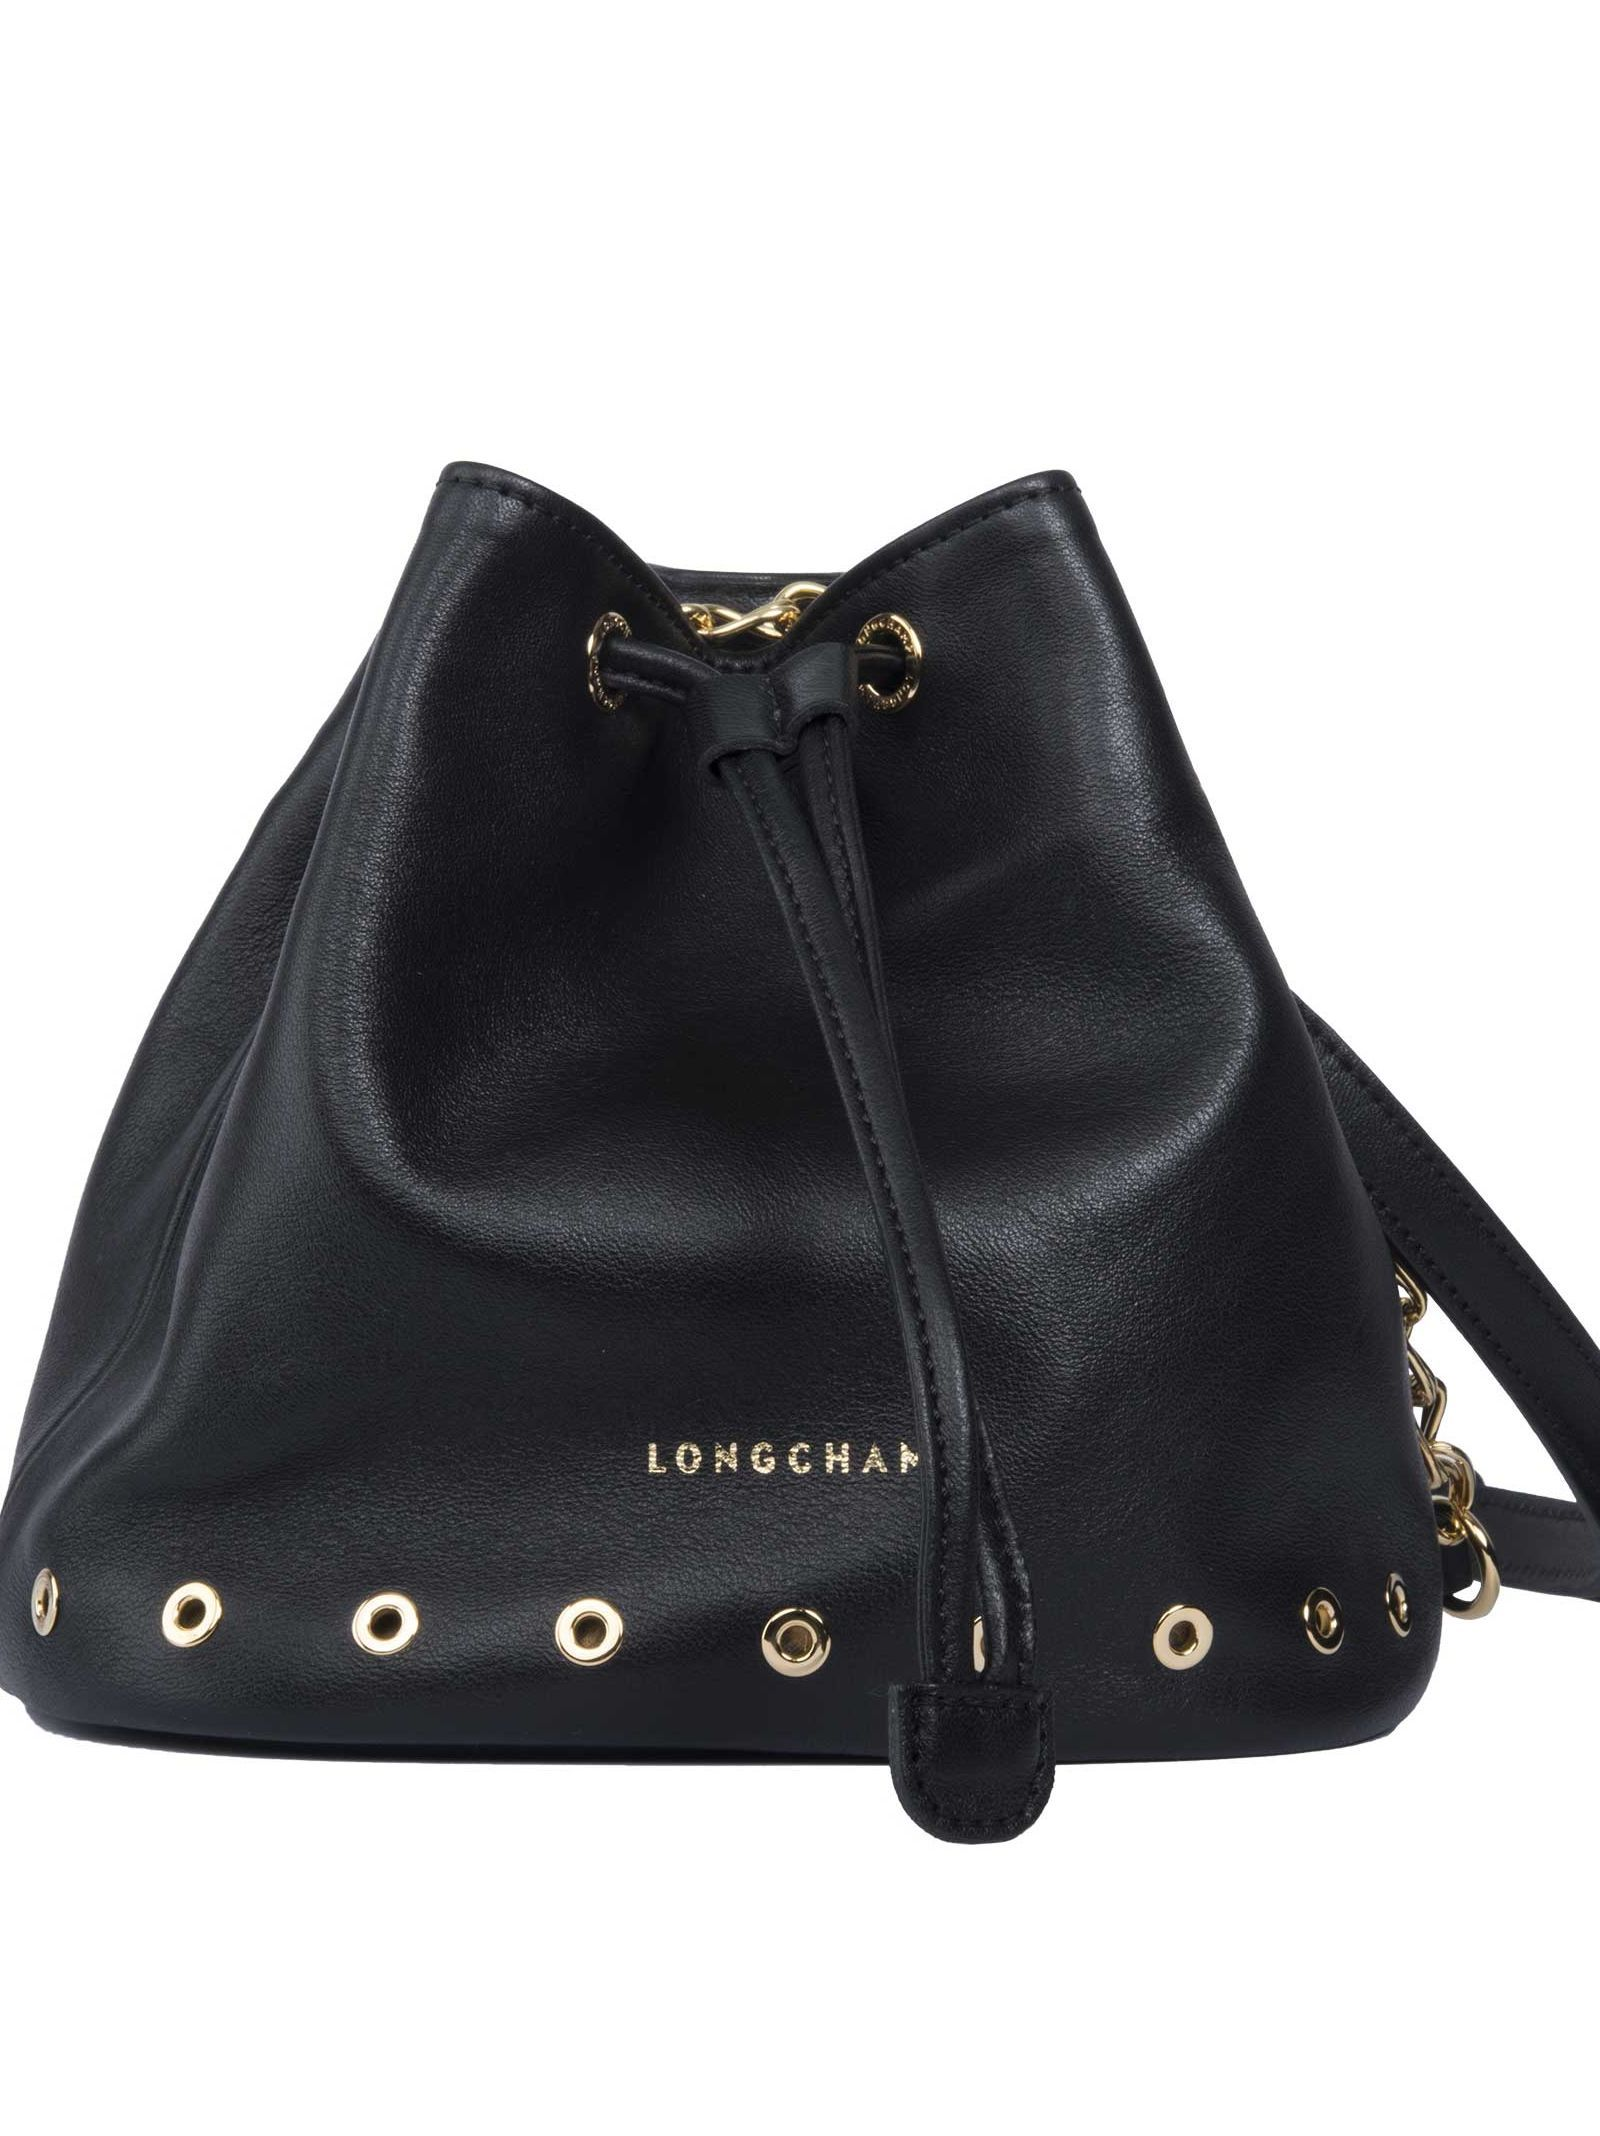 LONGCHAMP PARIS ROCKS CROSSBODY BAG.  longchamp  bags  shoulder bags   leather  crossbody   f1fabb510042f